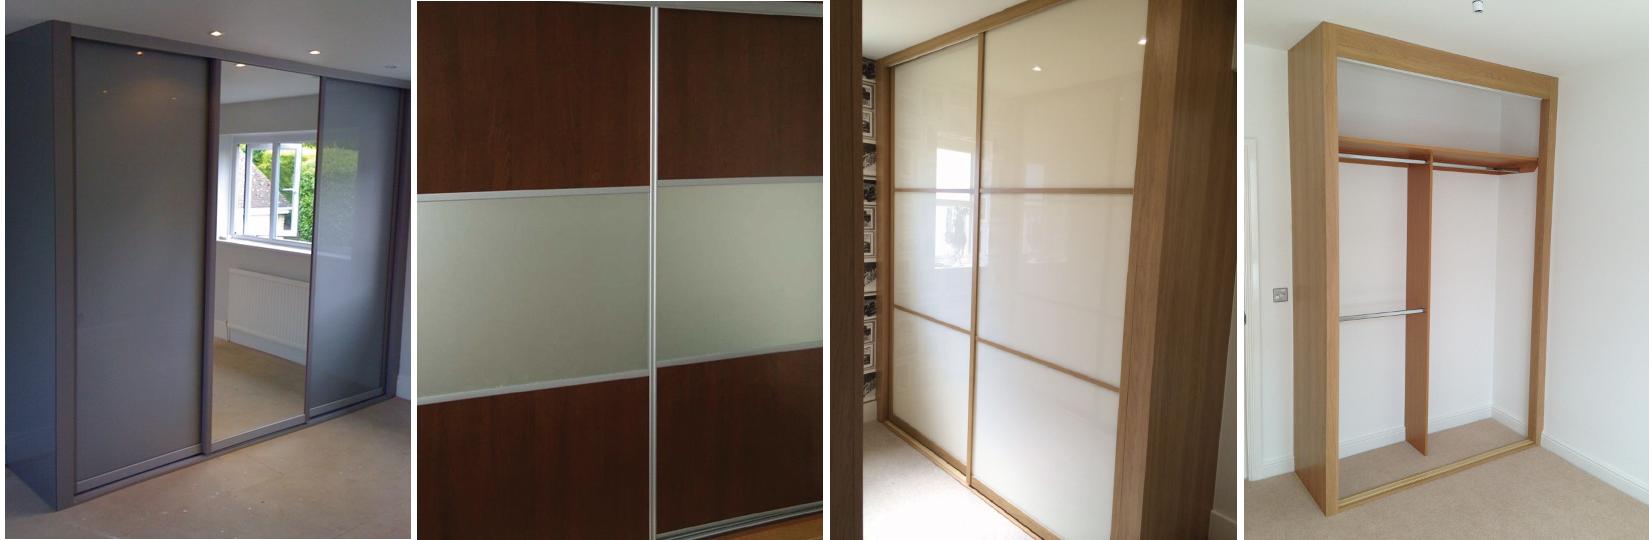 Banner4 - sliding wardrobe doors